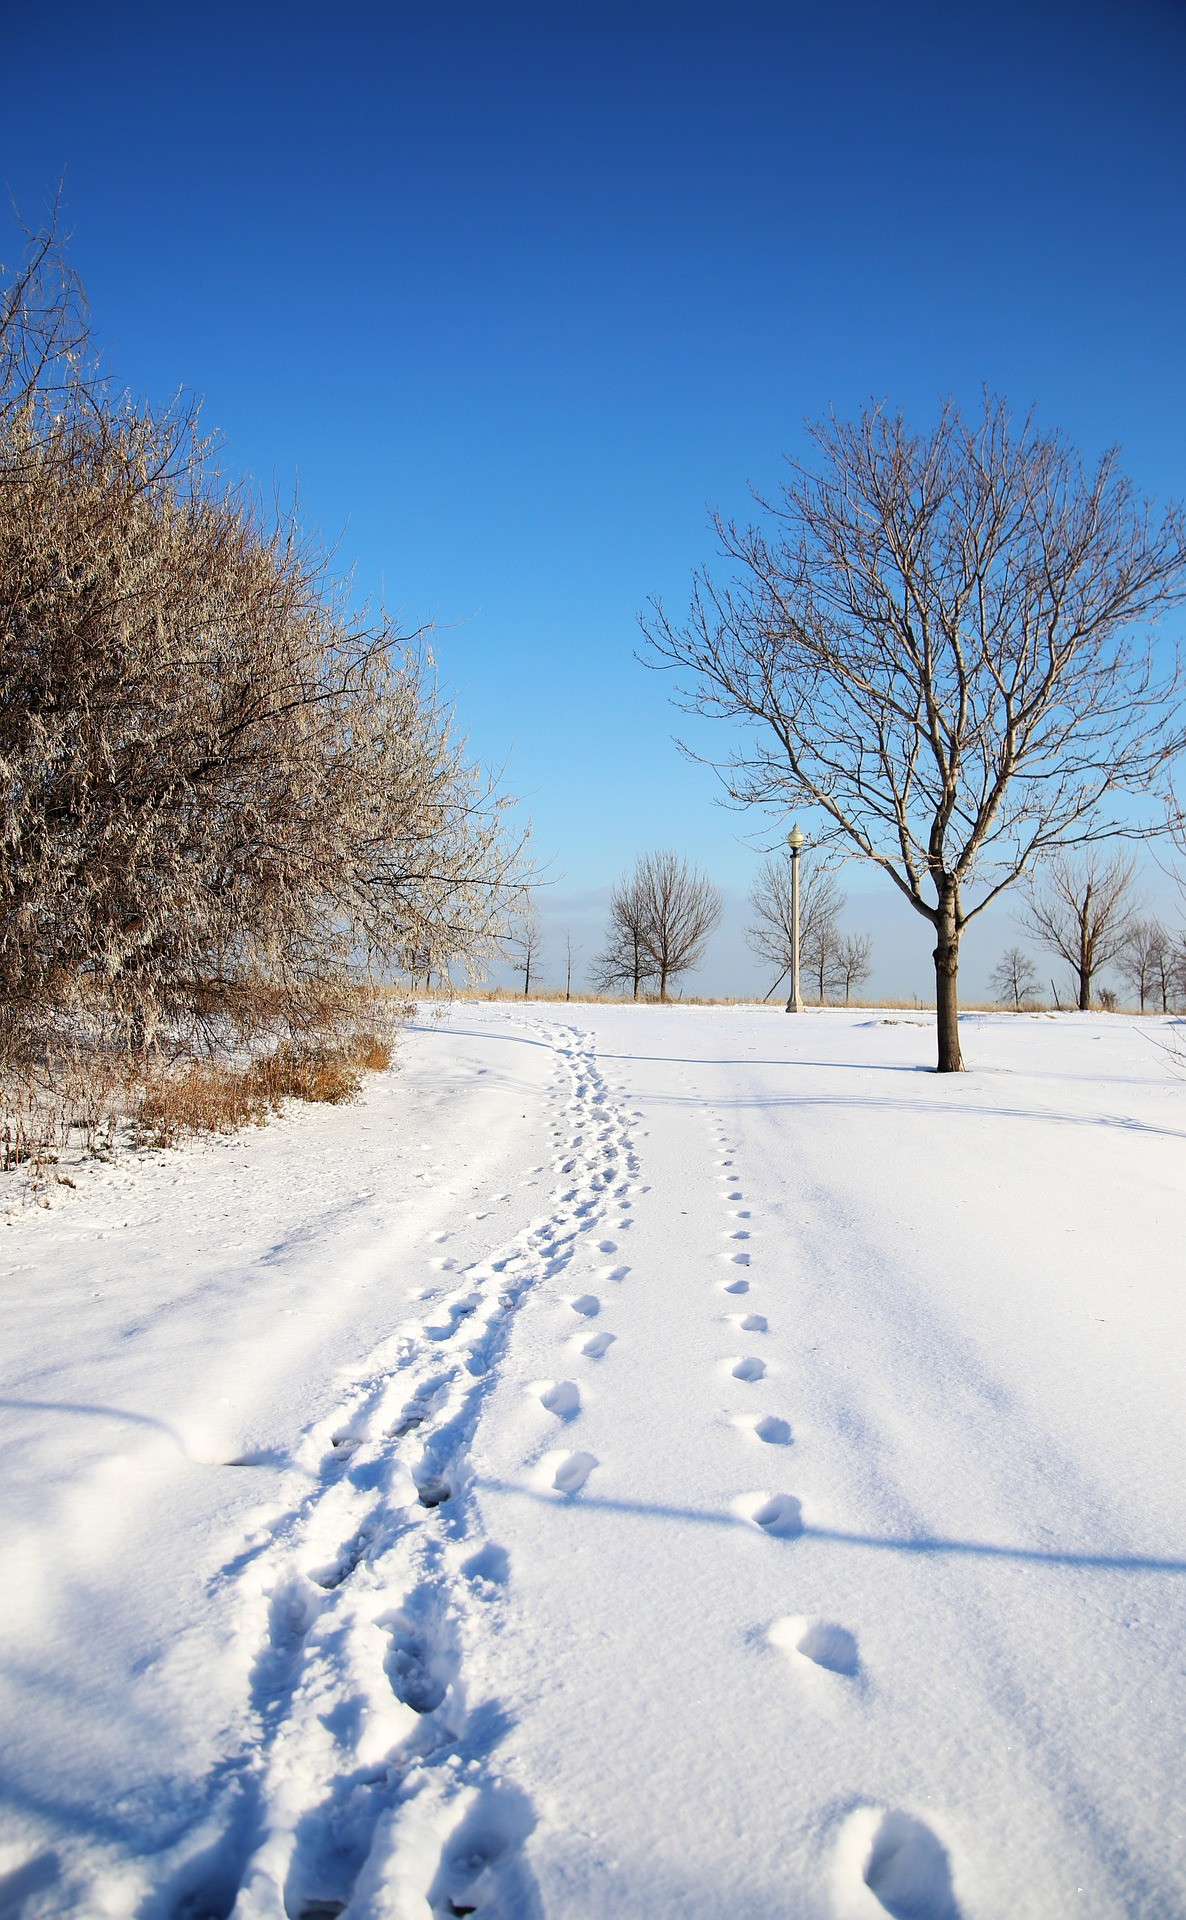 Feze Roofing | Elmhurst Roofing | Chicago Winter